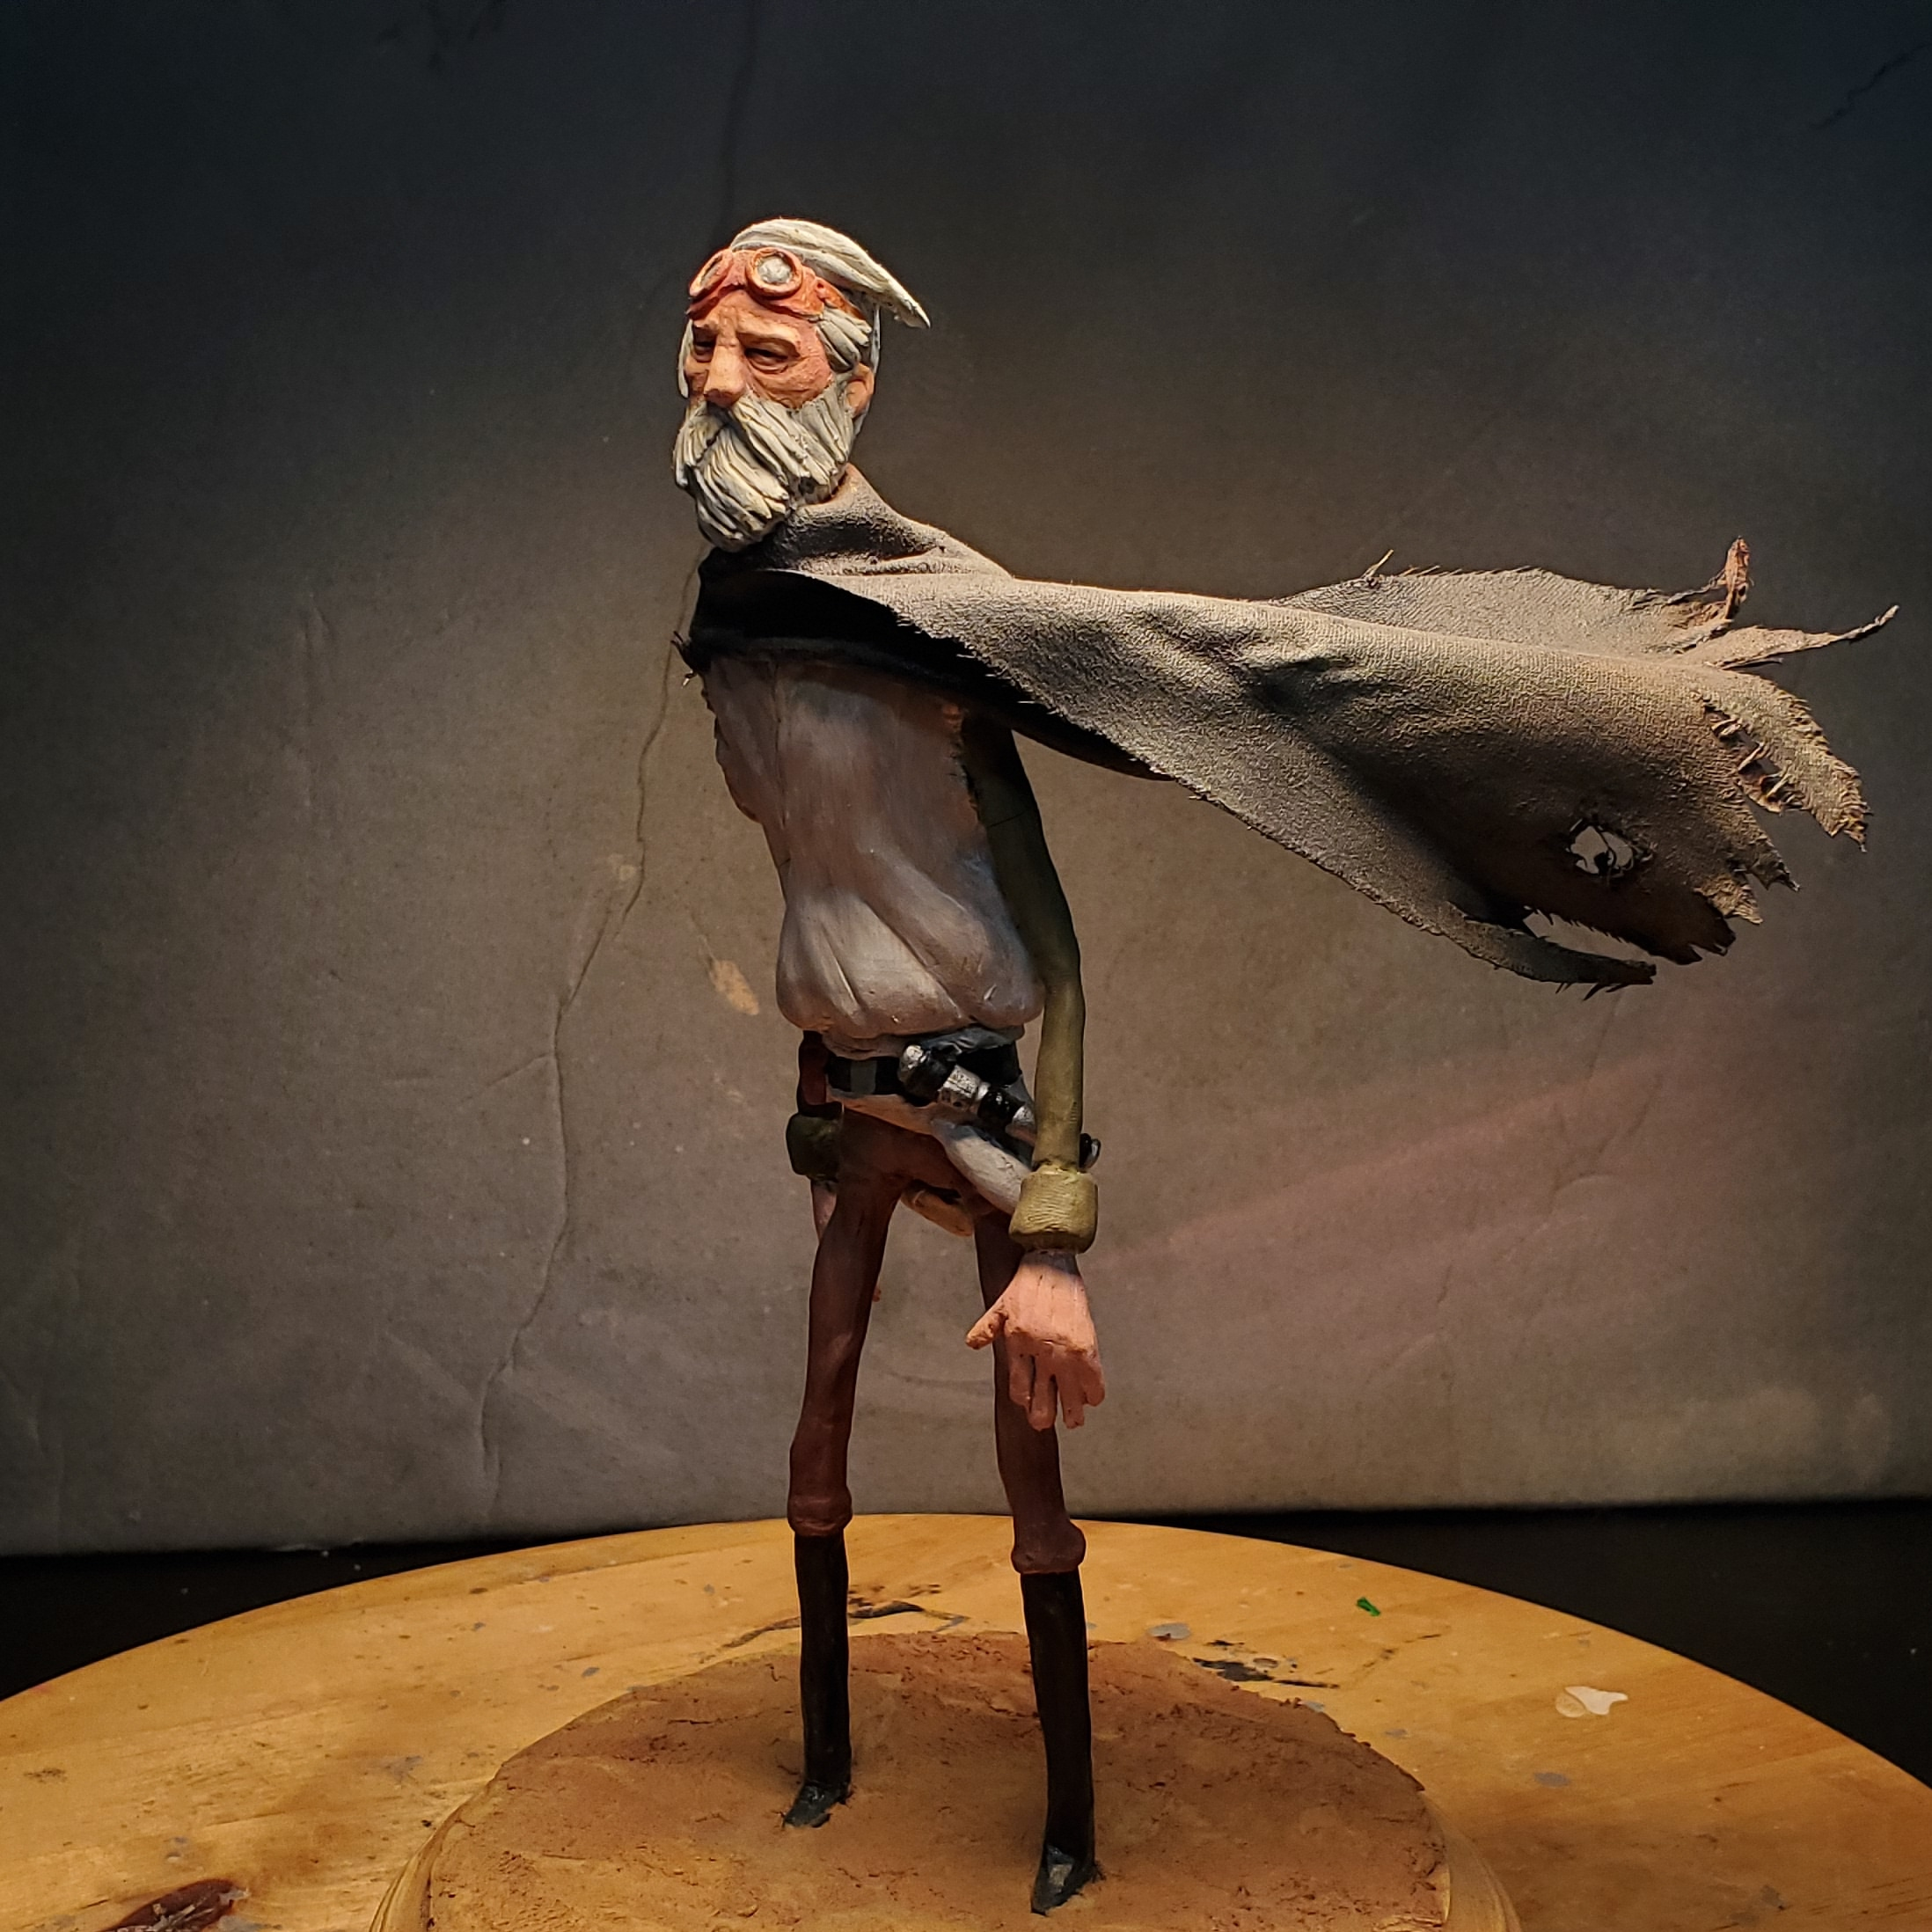 My Obi Wan sculpture